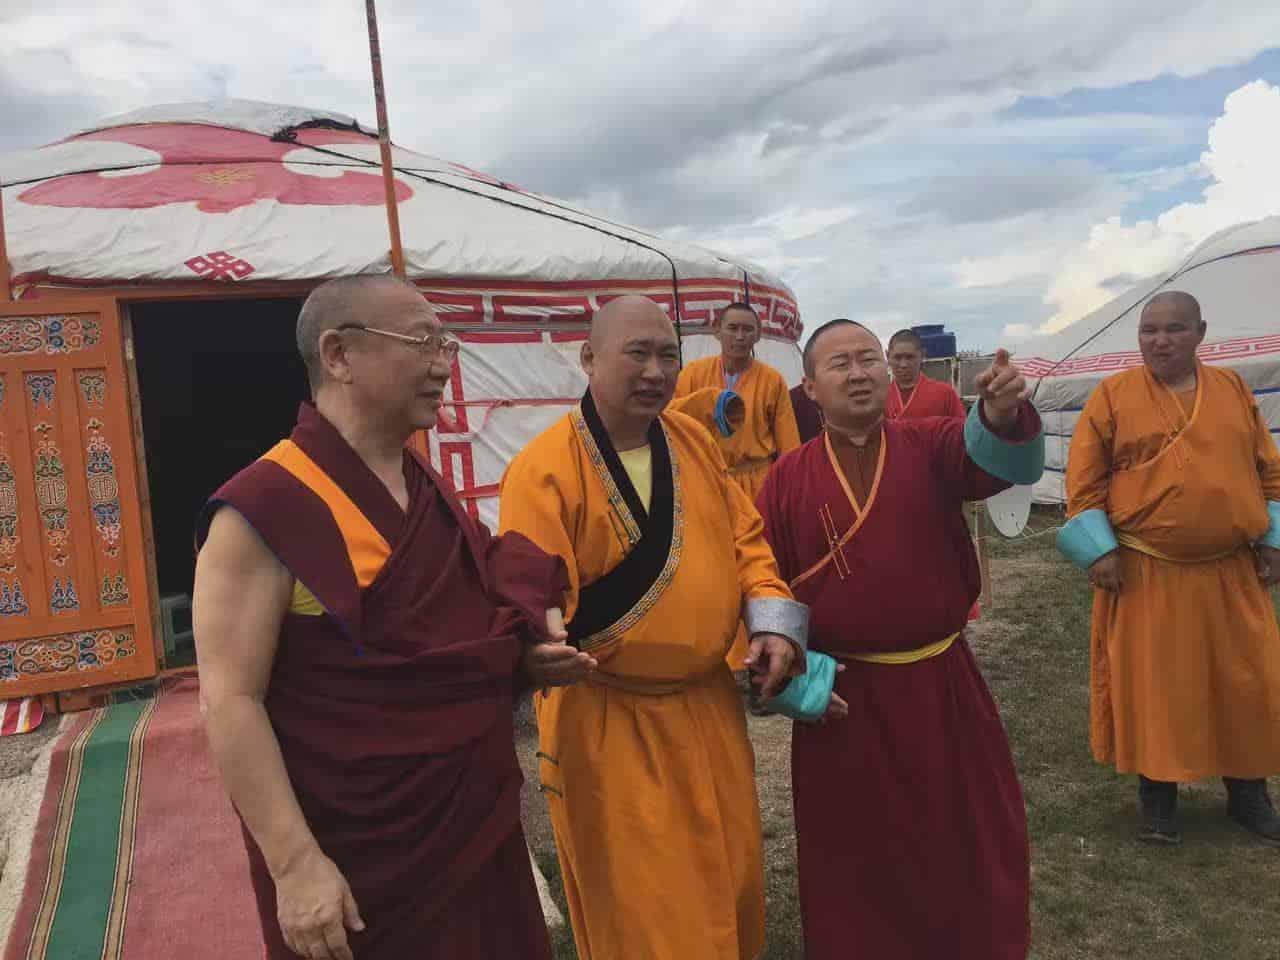 gosok-rinpoche-mongolia-2016-db262d0b6da58cab953eb6ba959b7e2